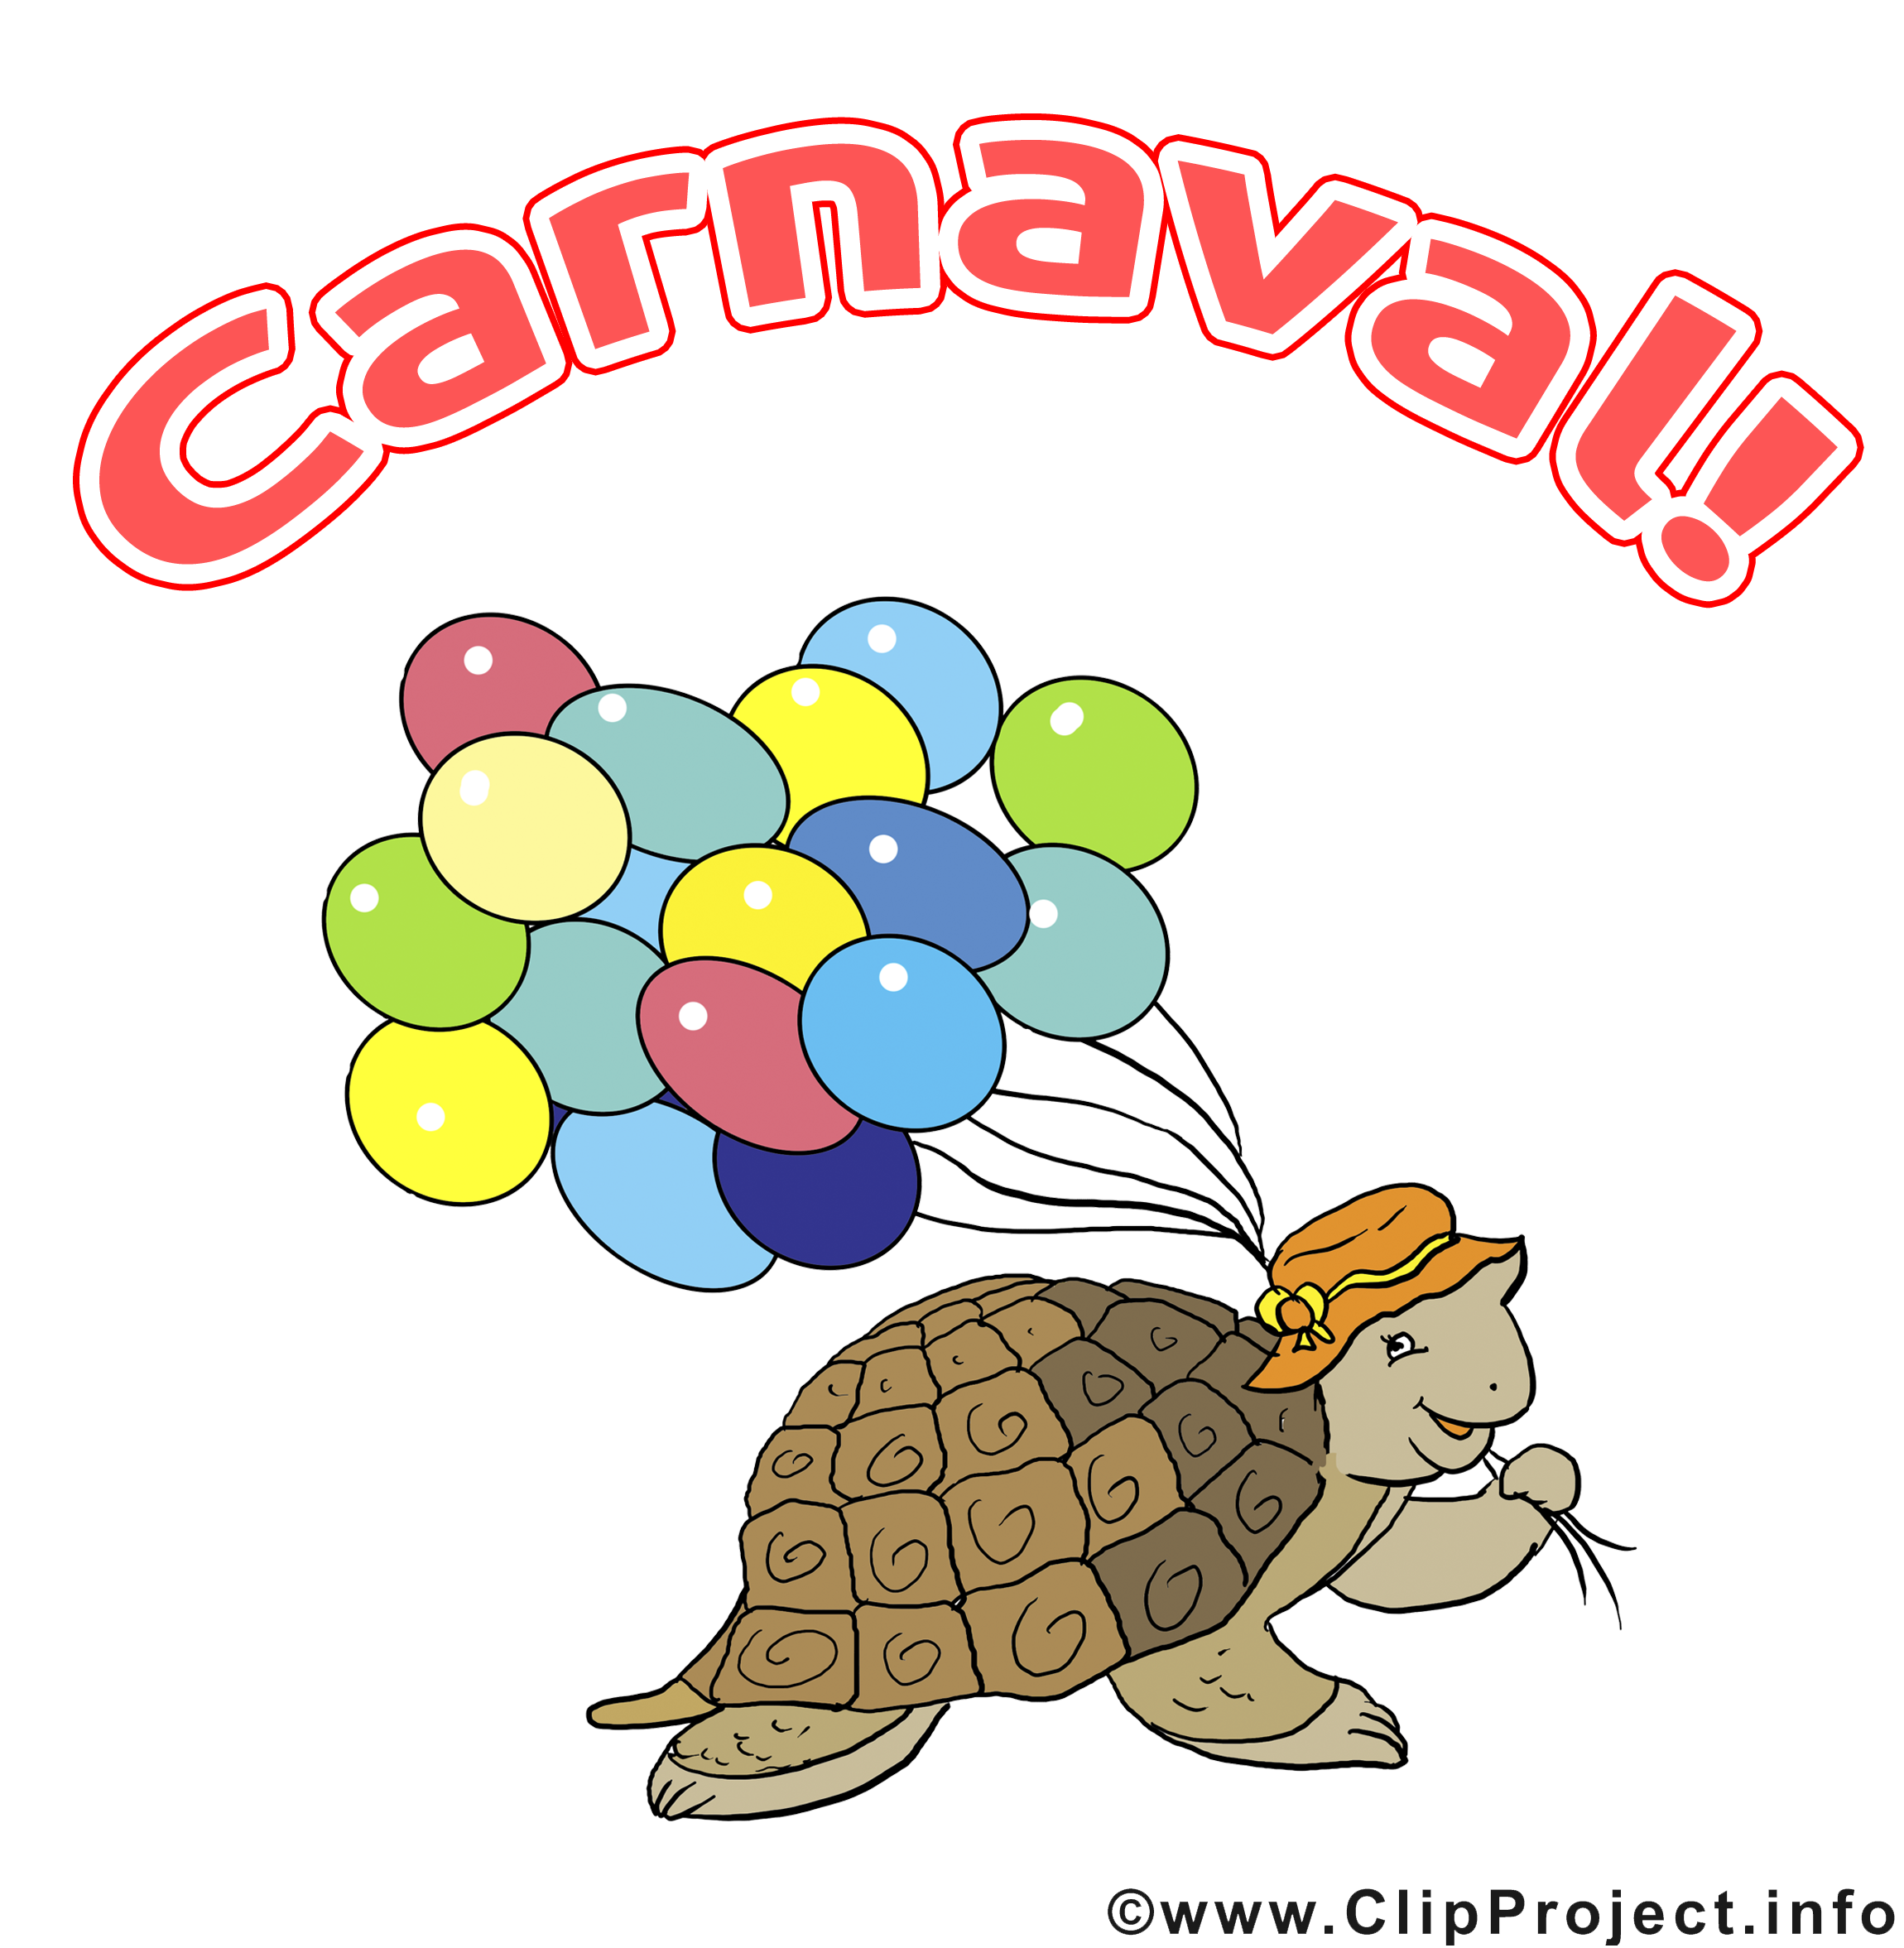 Tortue ballons images – Carnaval dessins gratuits